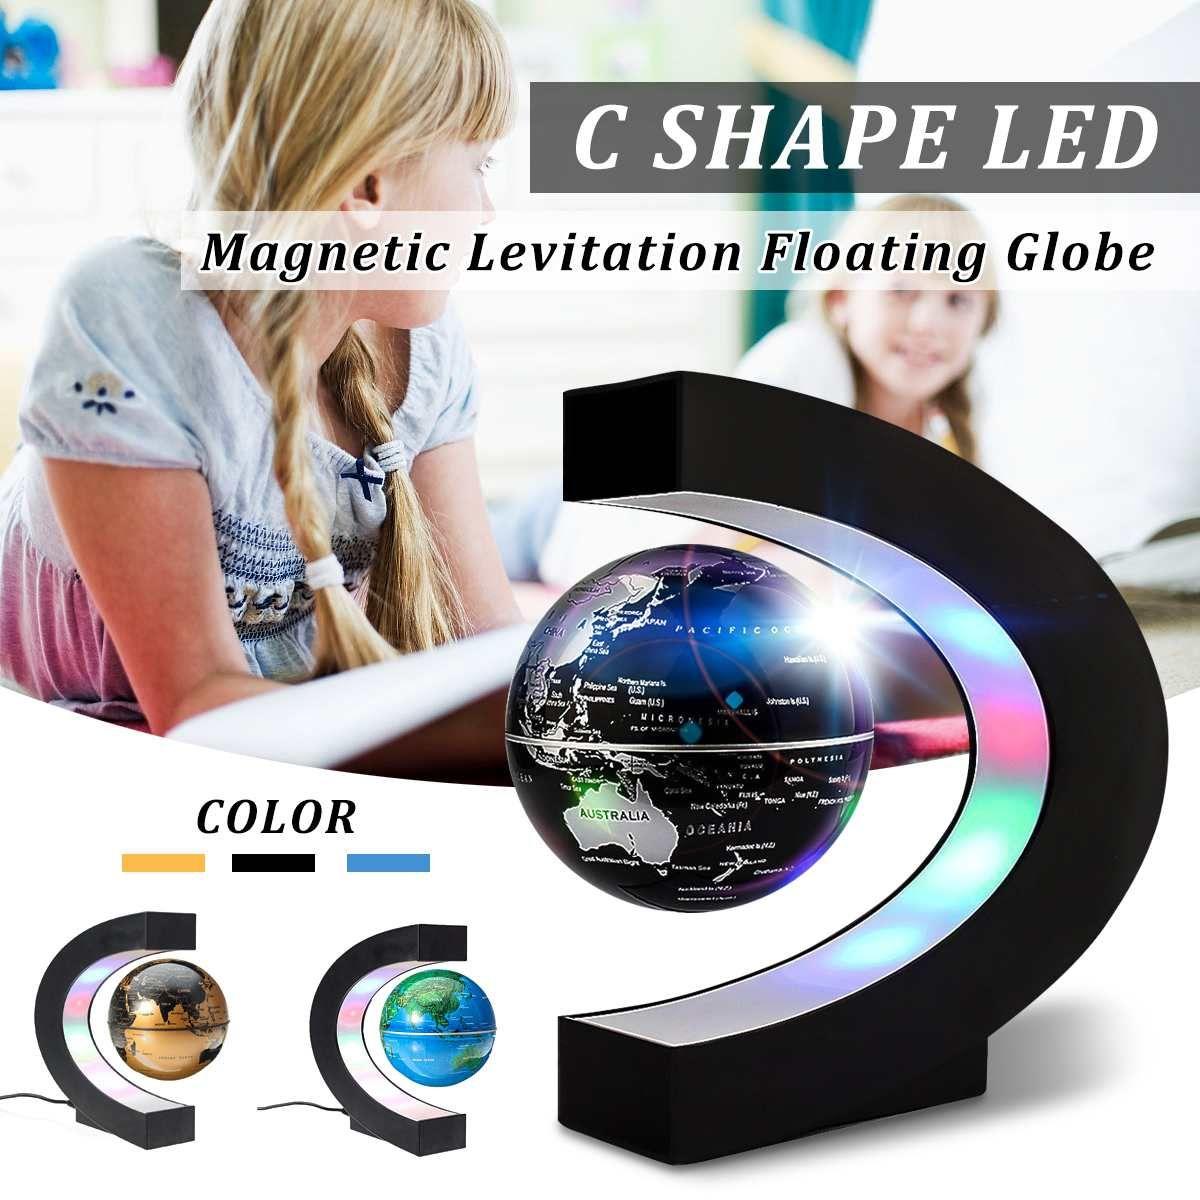 Magnetic Levitation Floating LED Illuminated Globe Terrestre World Earth Map Tellurion Children Geography Education Toys